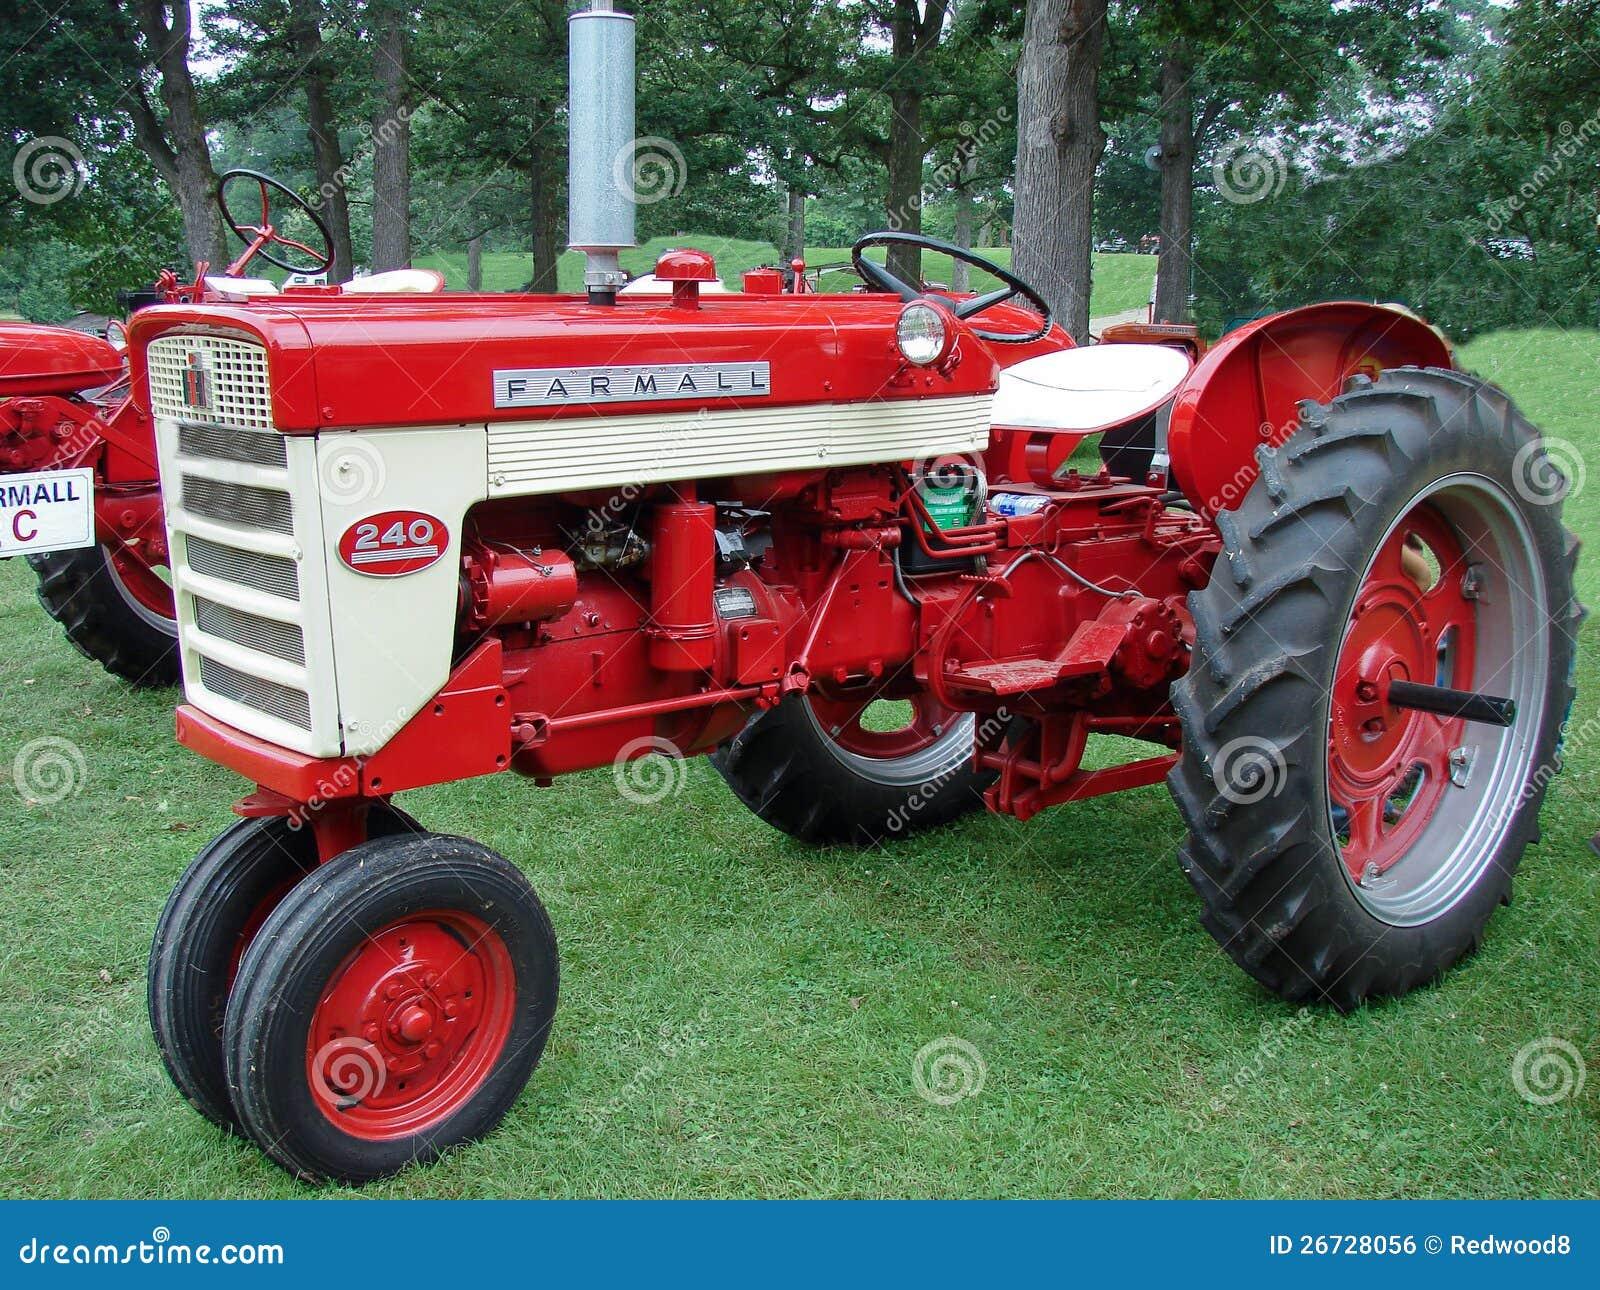 Farmall Tractor Models : Vintage farmall model farm tractor editorial photo